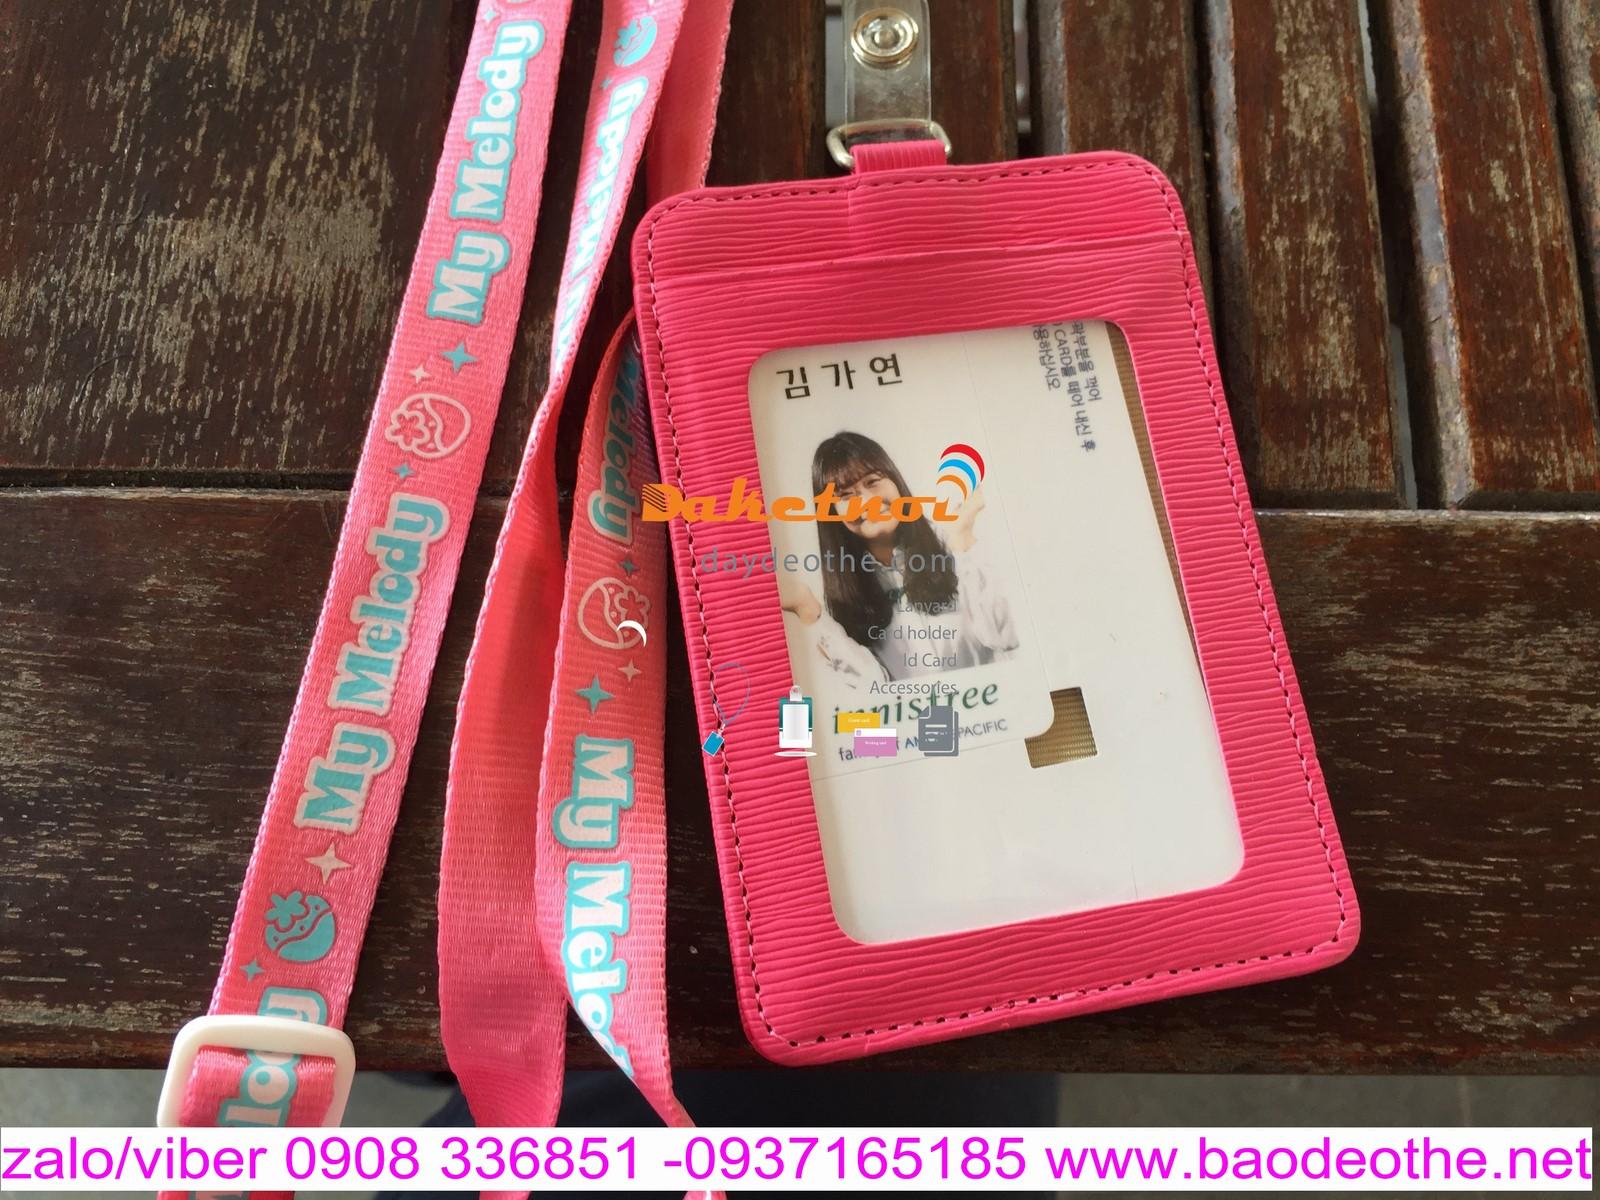 Bao đeo thẻ màu  hồng  phấn da pu dọc hay ngang